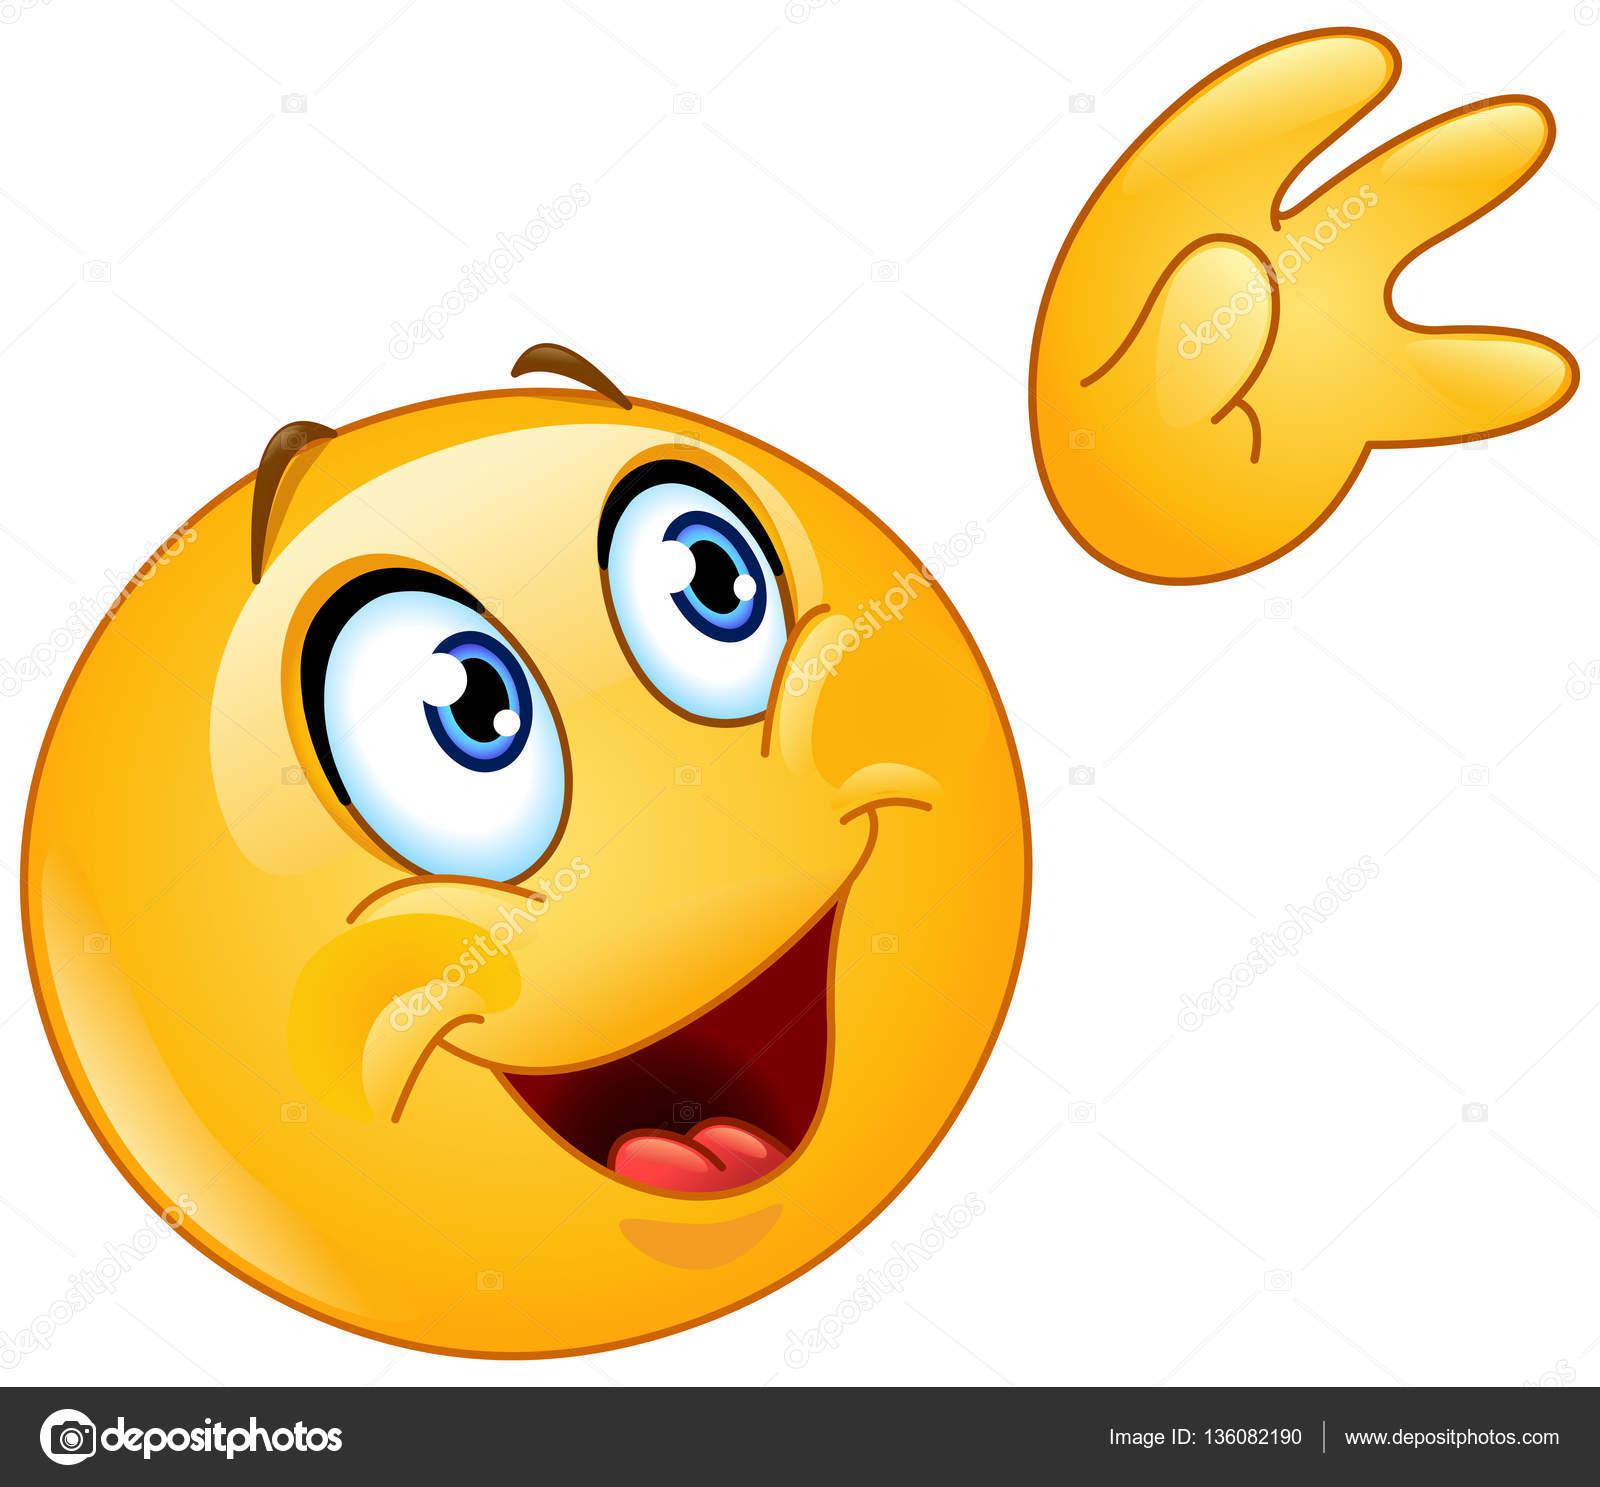 winken zum himmel emoticon stockvektor  u00a9 yayayoyo 136082190 farewell clip art school farewell clip art images